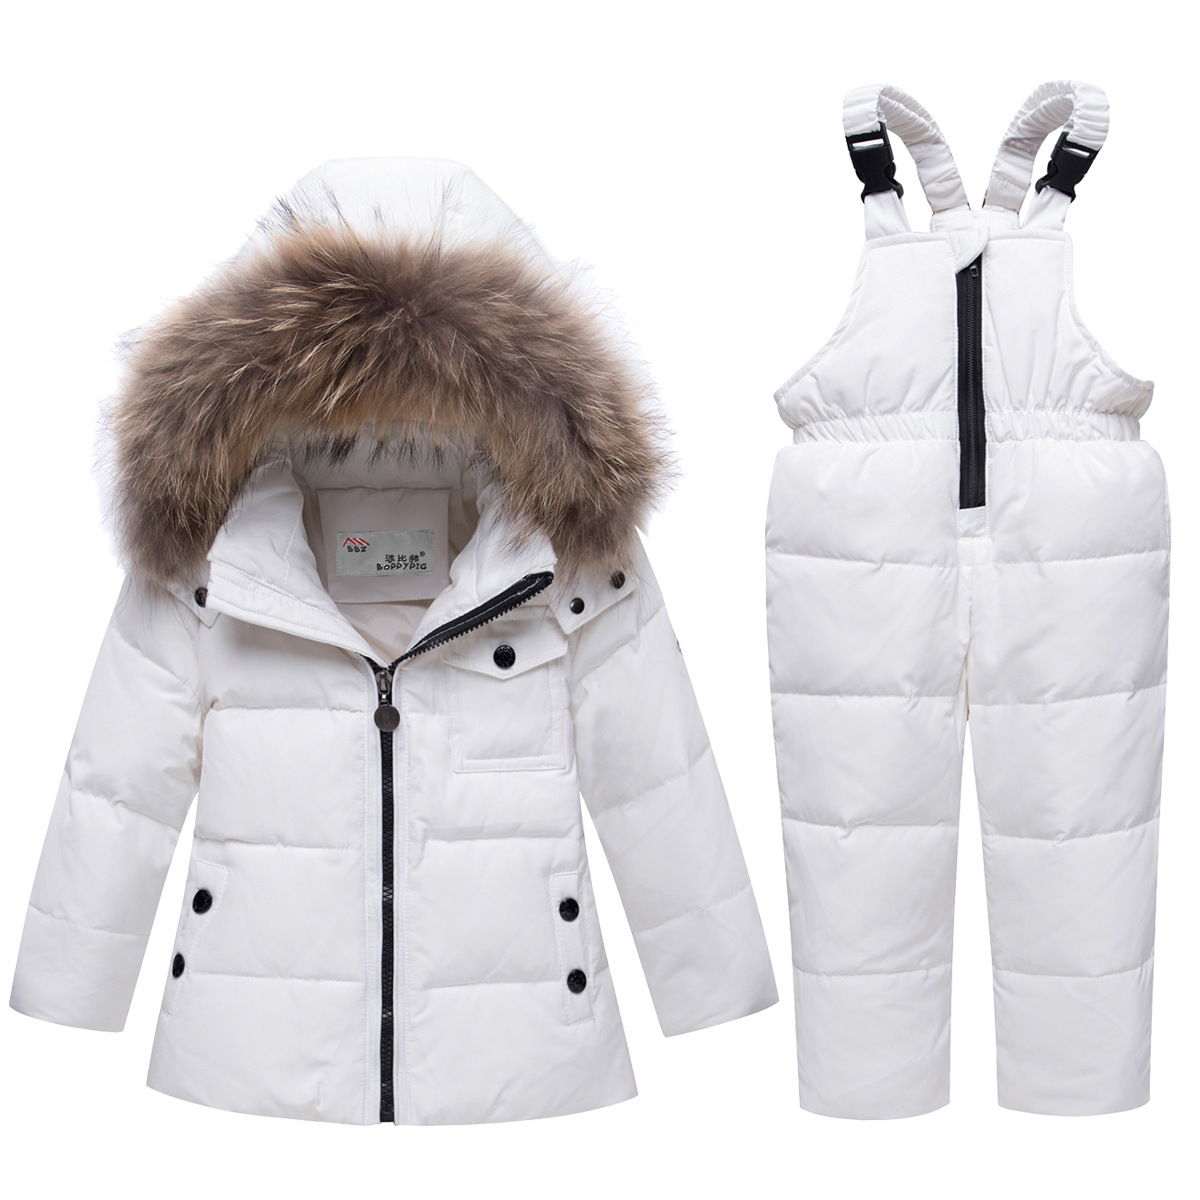 Russian Winter Suits for Boys Girls 2018 Ski Suit Children Clothing Set Baby Duck Down Jacket Coat + Overalls Warm Kids Snowsuit цена